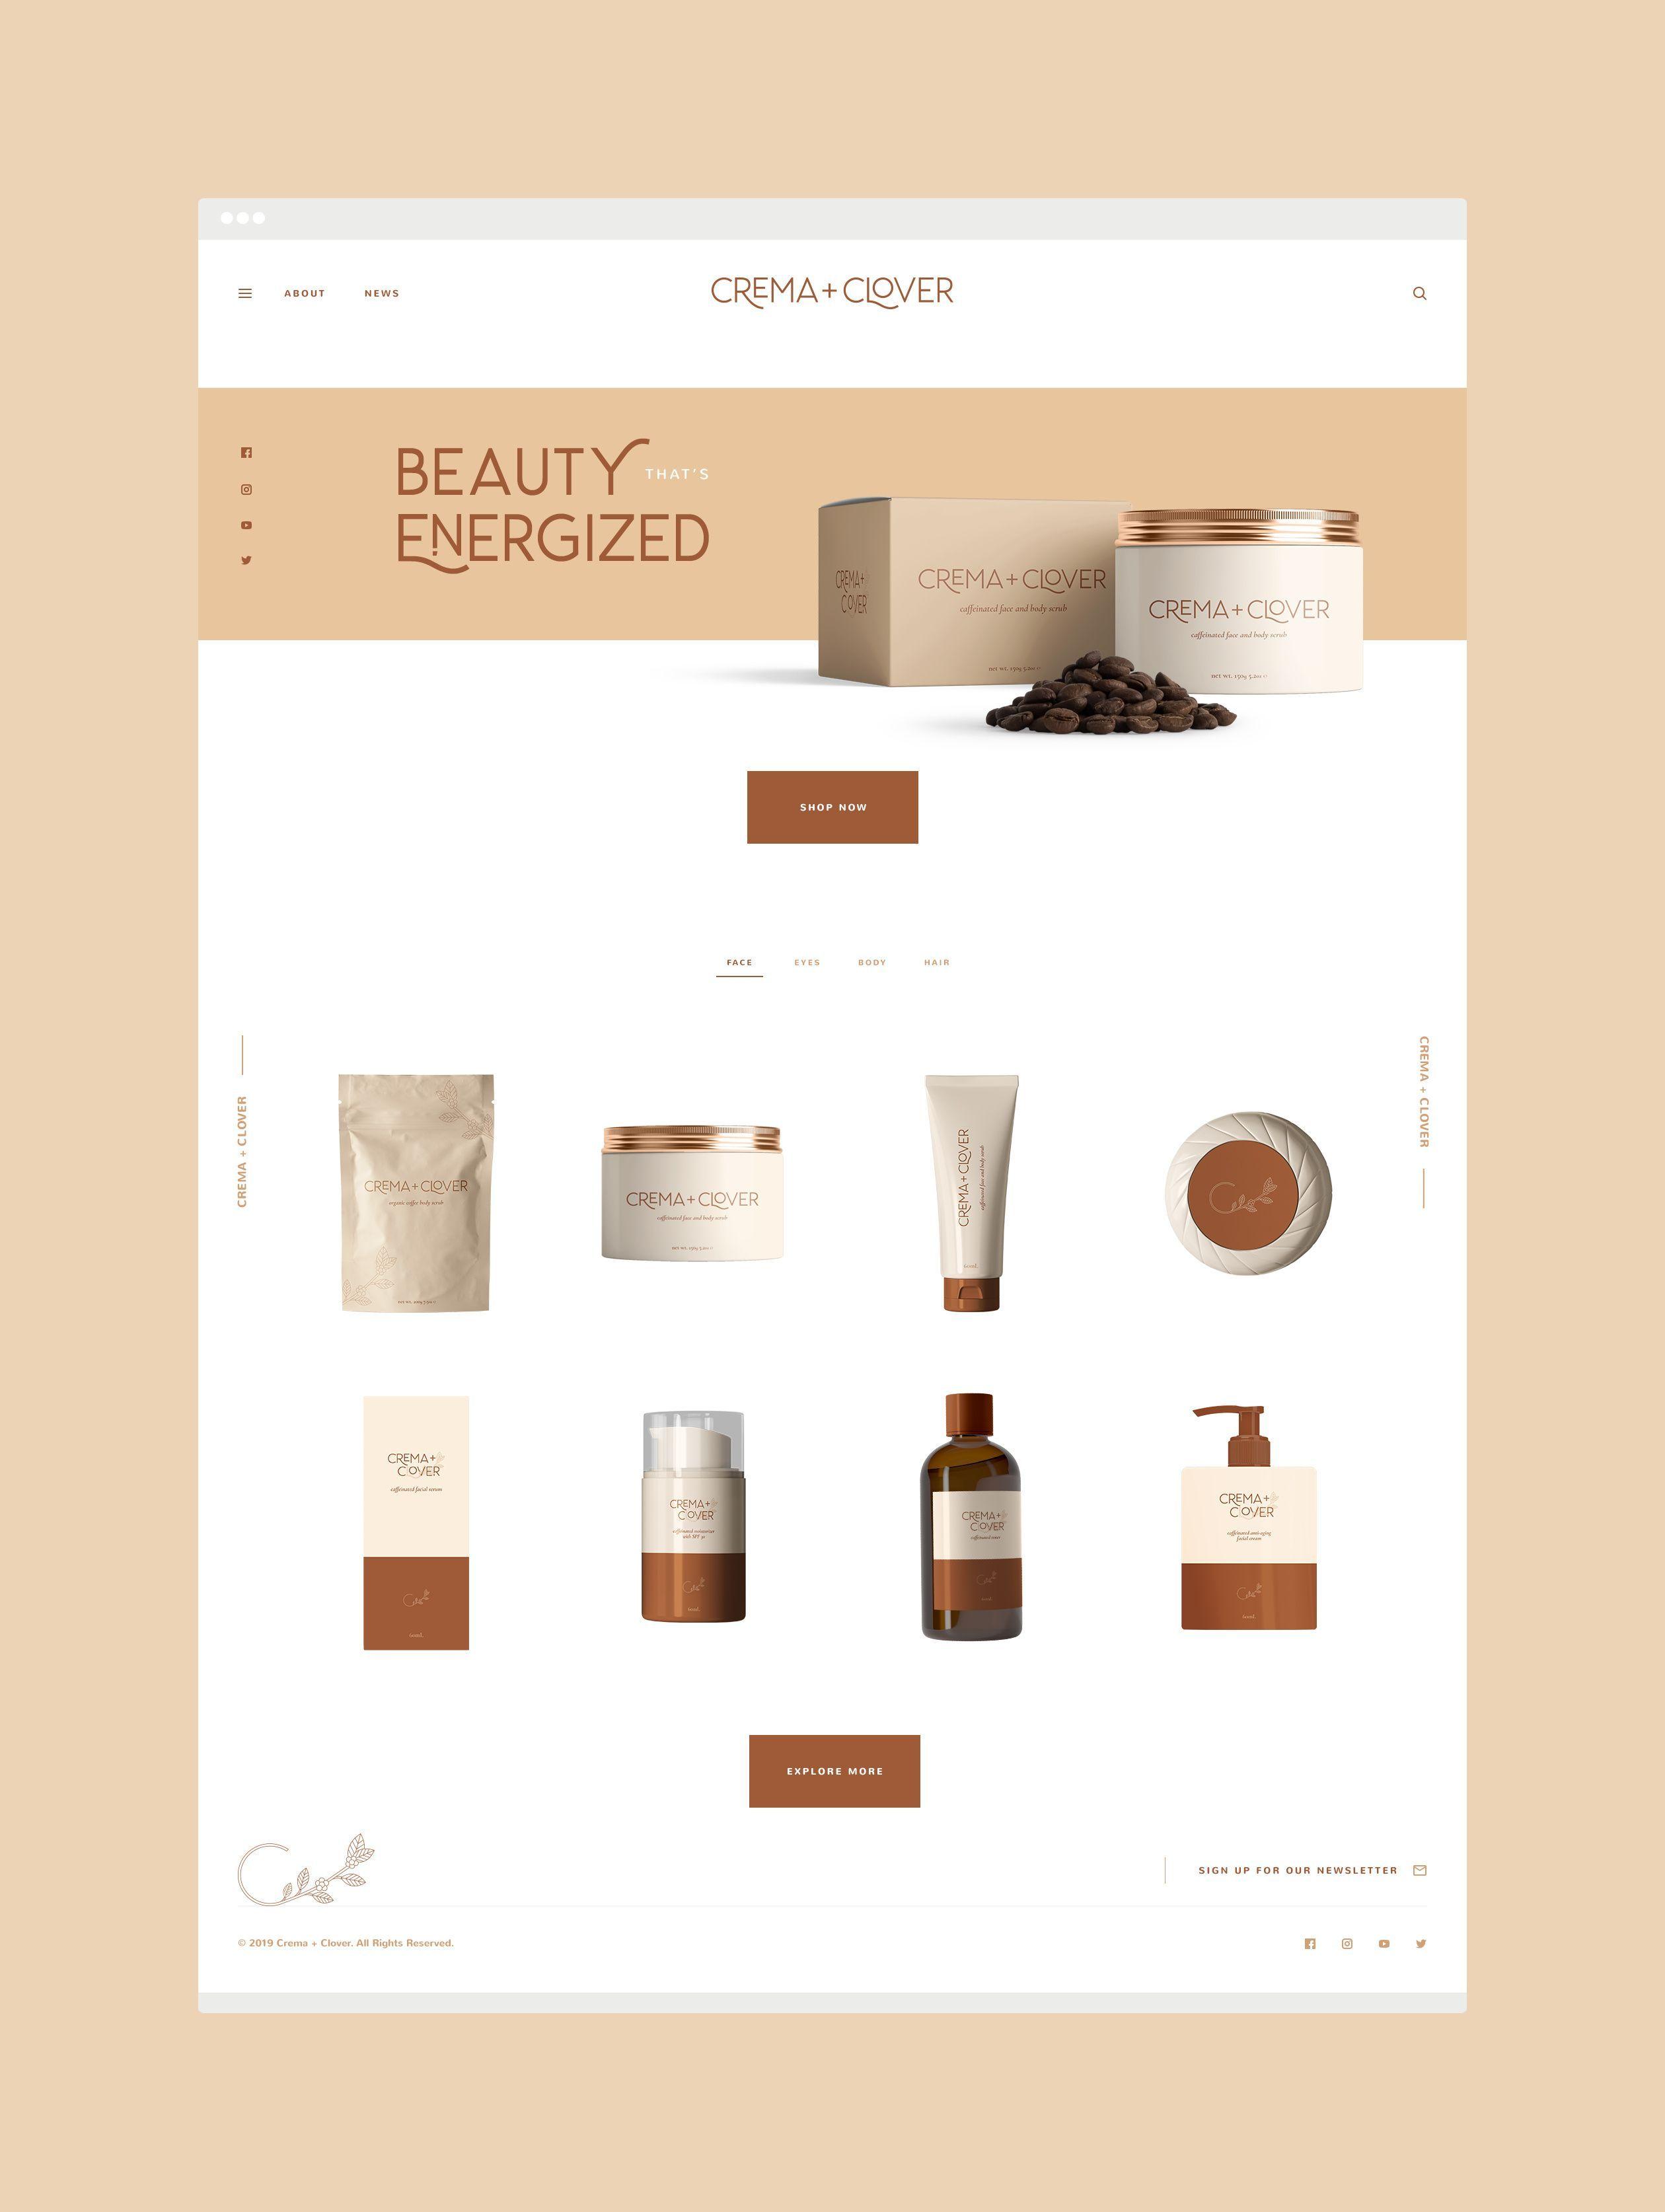 Crema And Clover Website Design Assimilation Designs In 2020 Website Design Branding Design Inspiration Website Design Inspiration